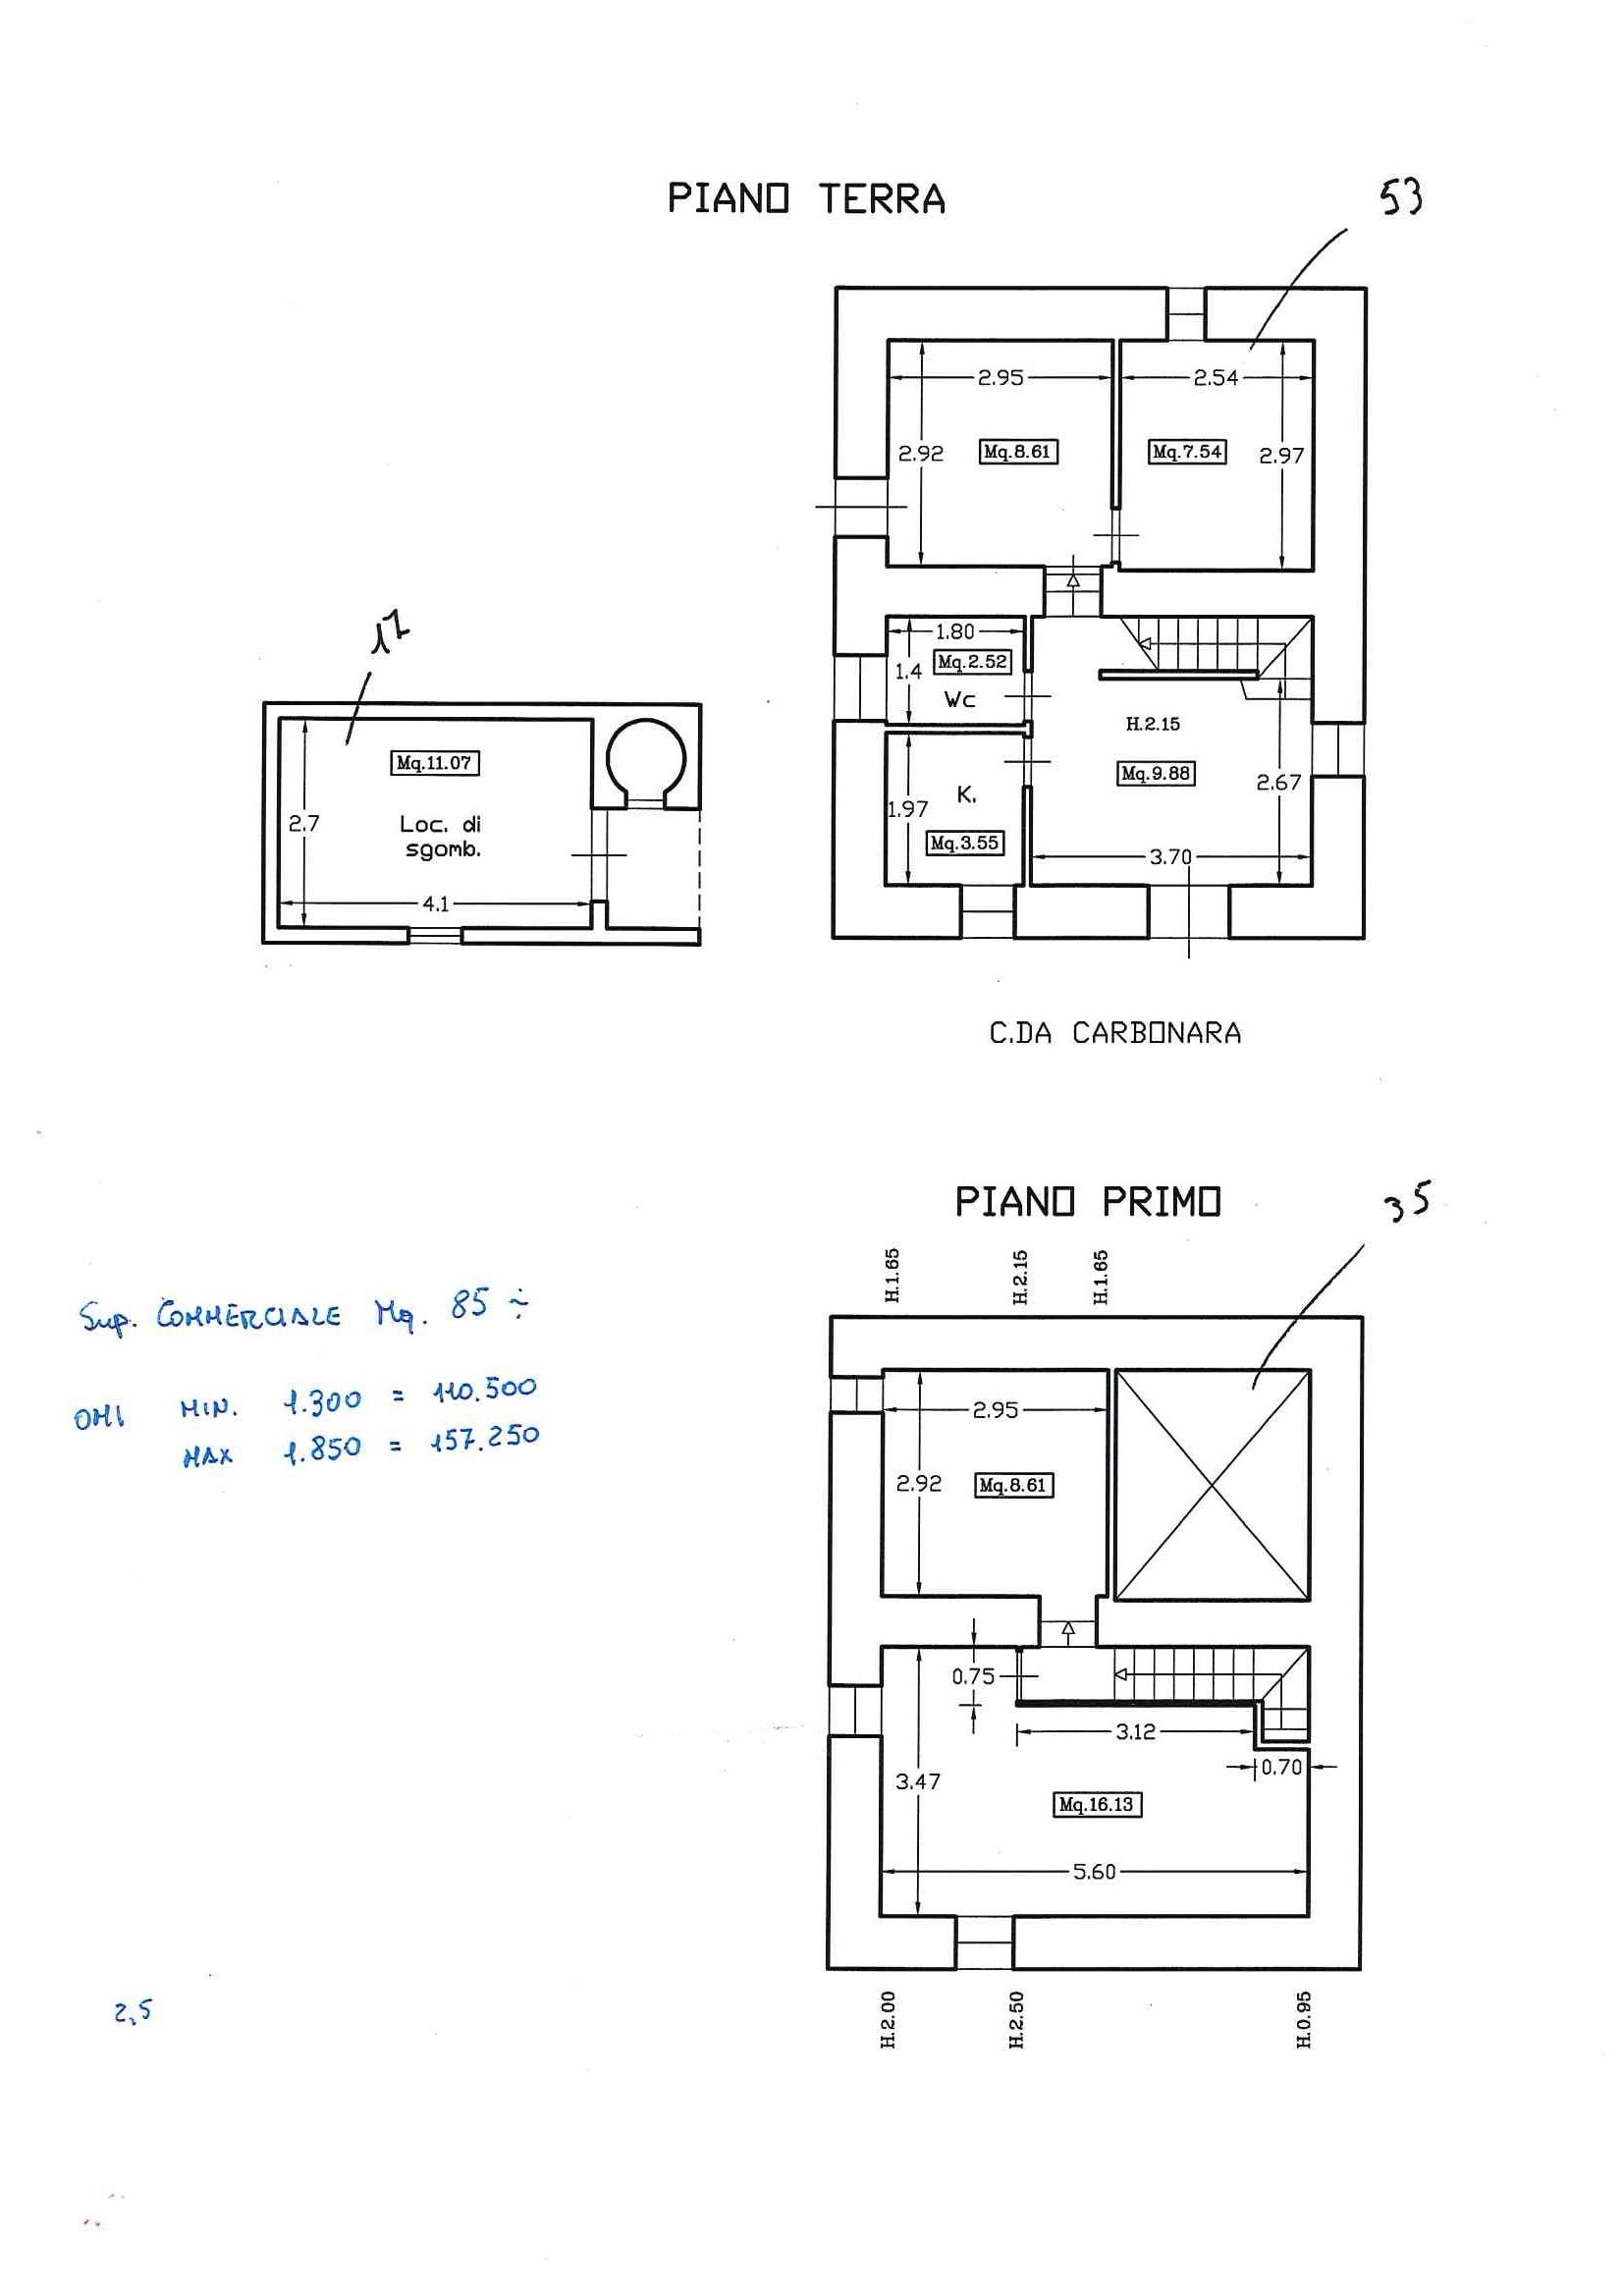 V053 planimetria2_page1_image1.jpg